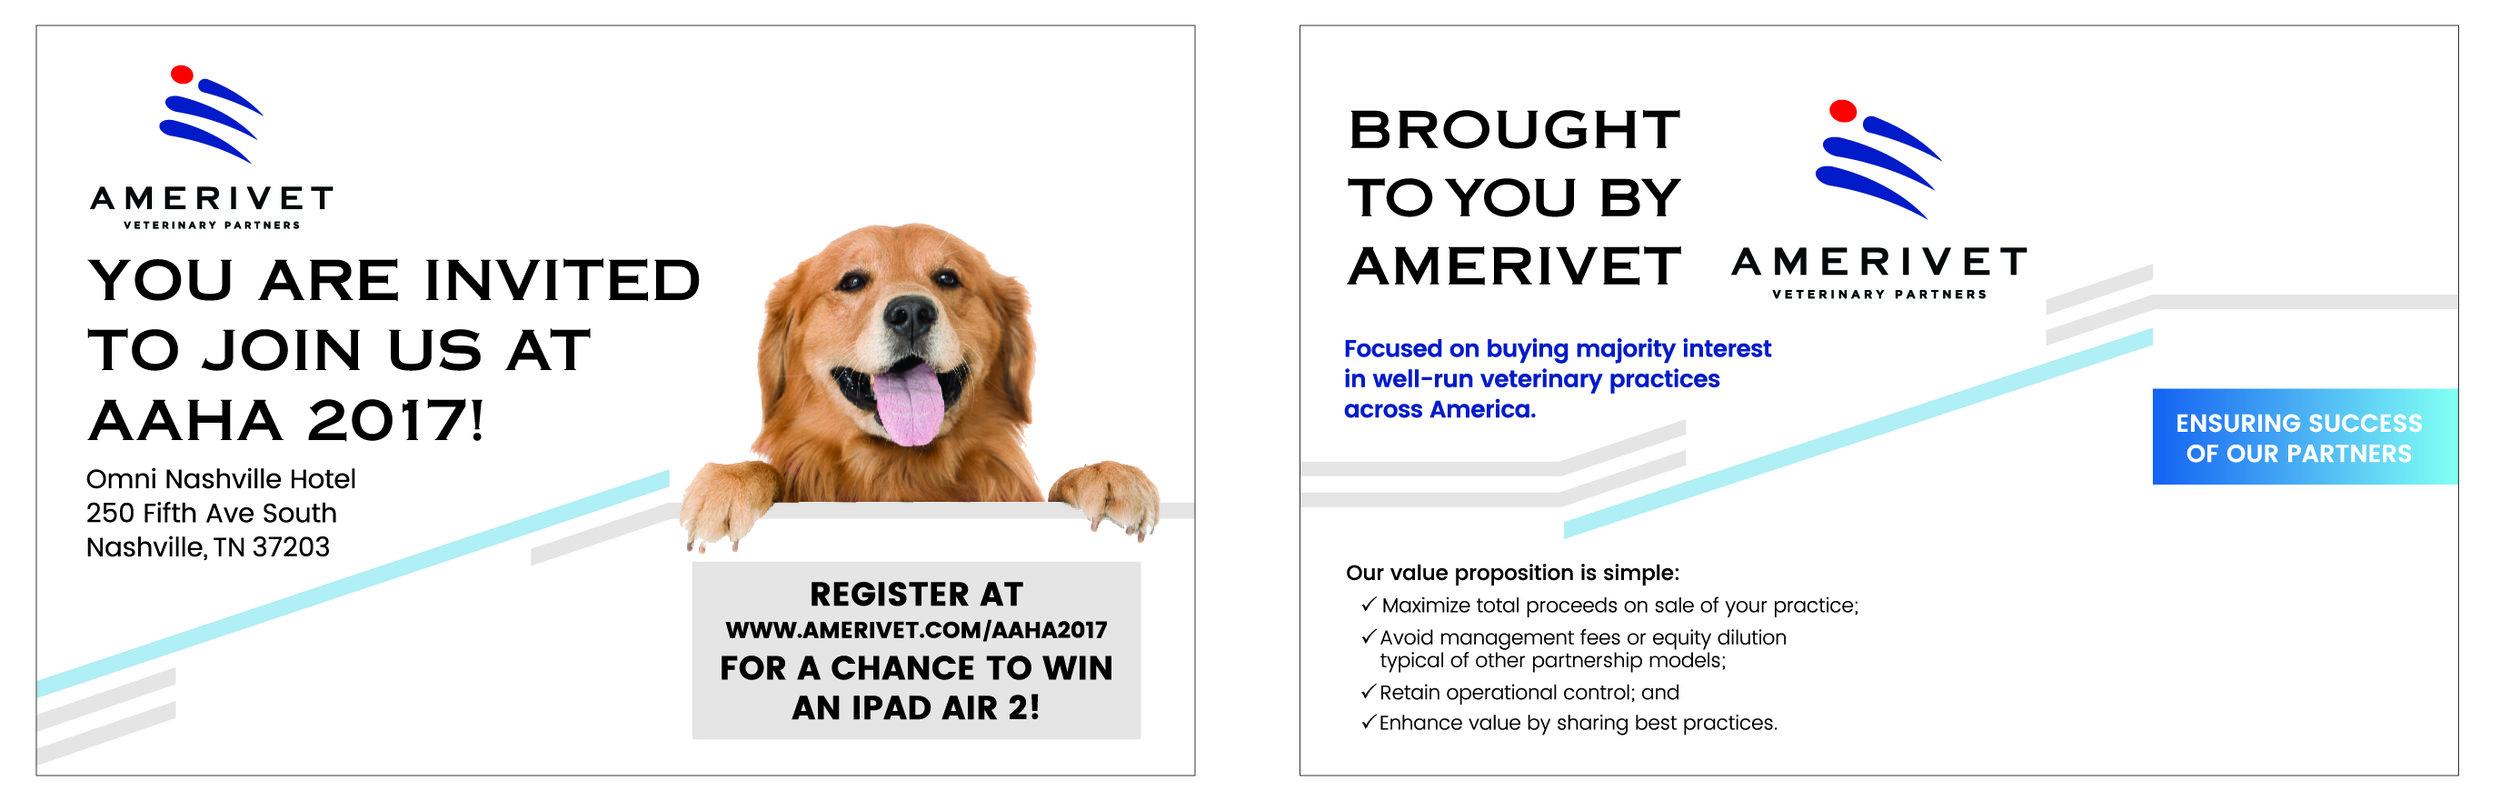 AmeriVet Conference Invite 8.5x5.5 (left) Font Side (right) Left Side